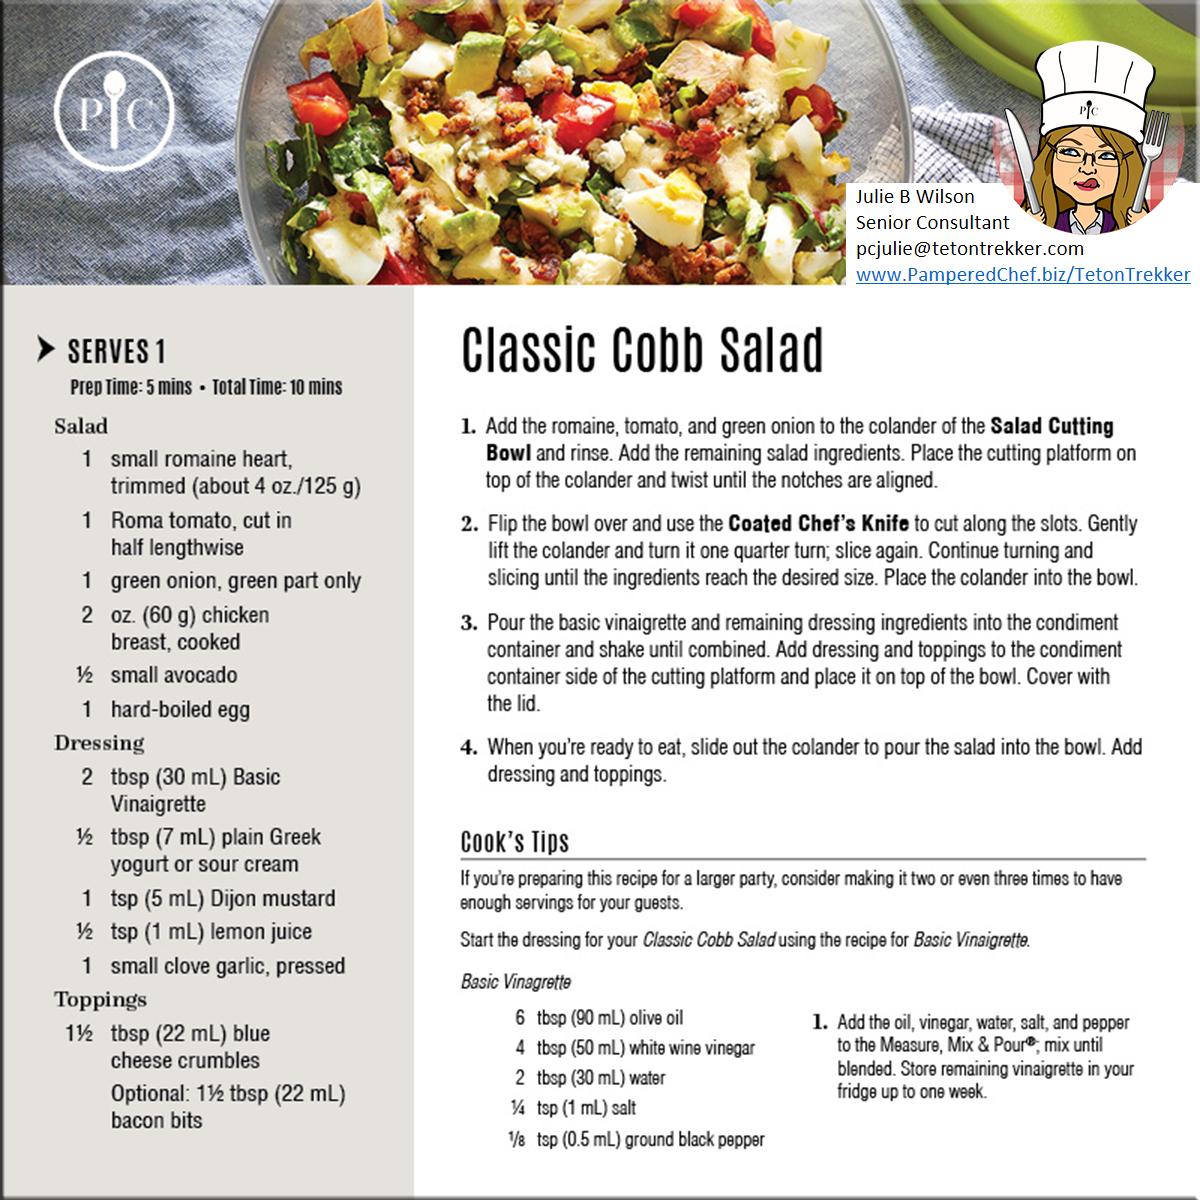 Classic-Cobb-Salad